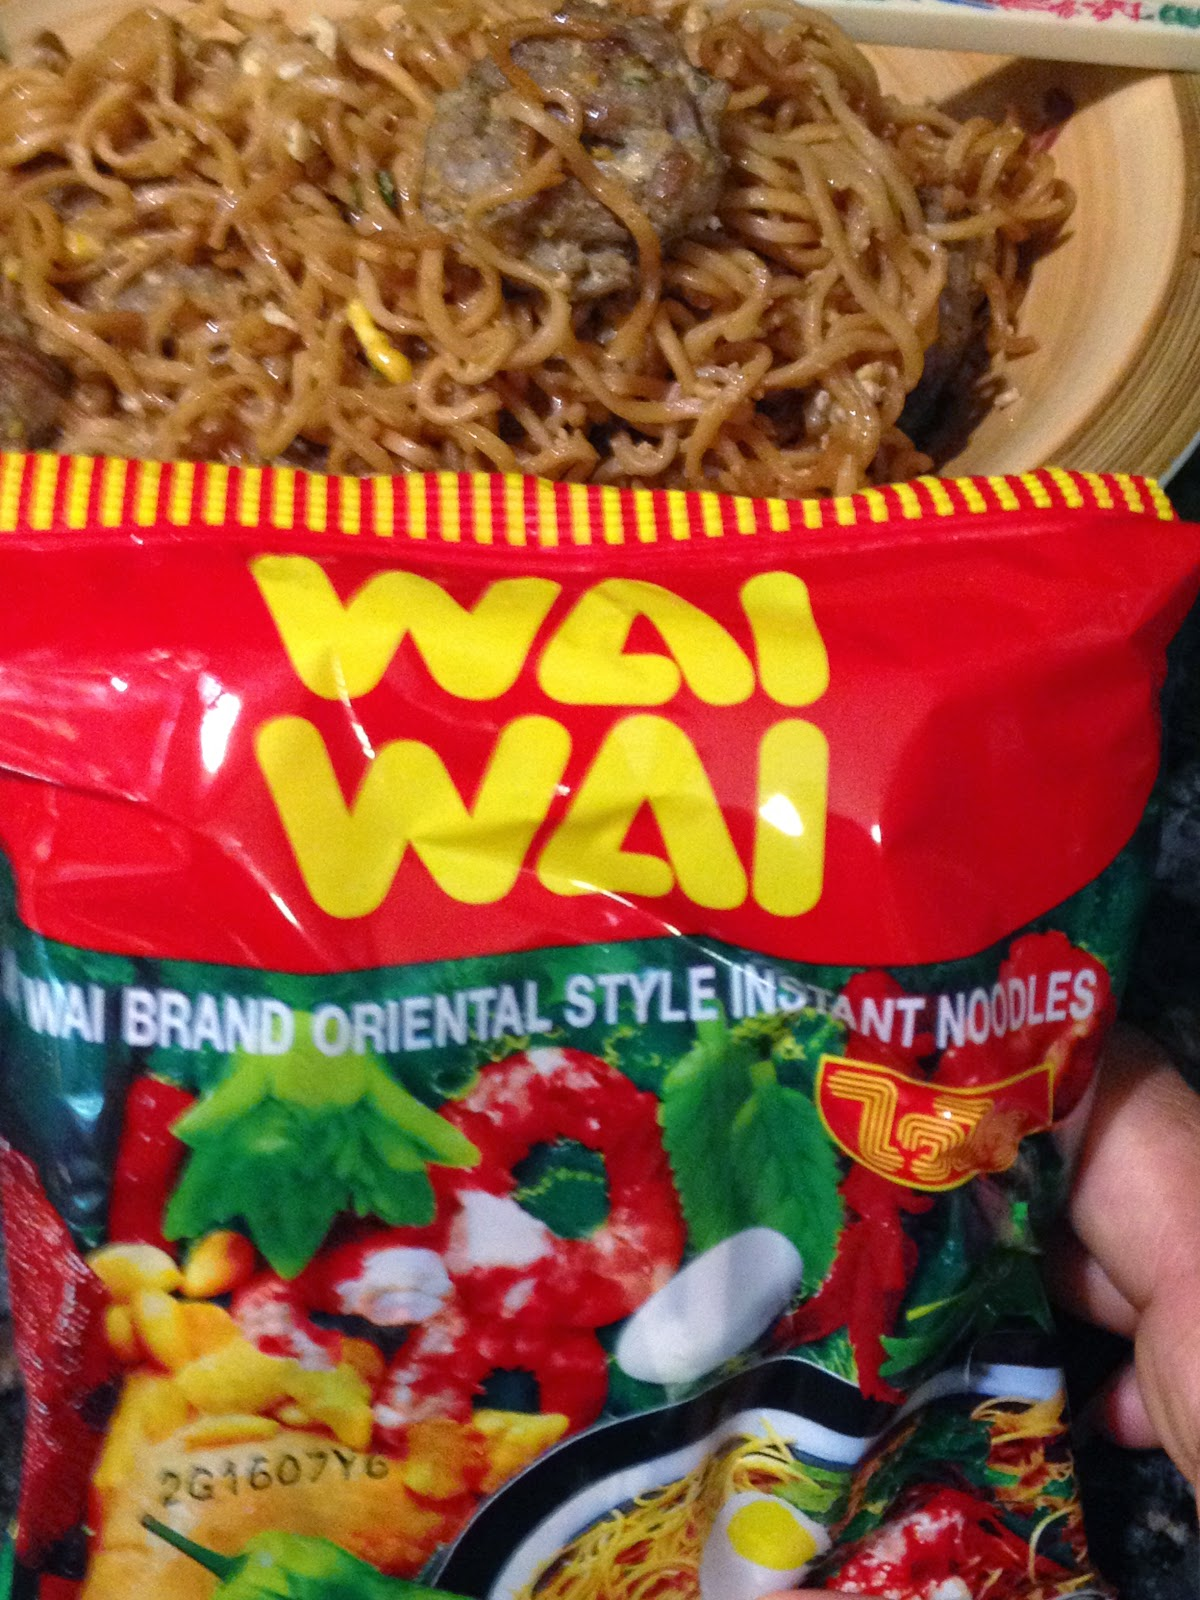 market segmentation of waiwai noodles